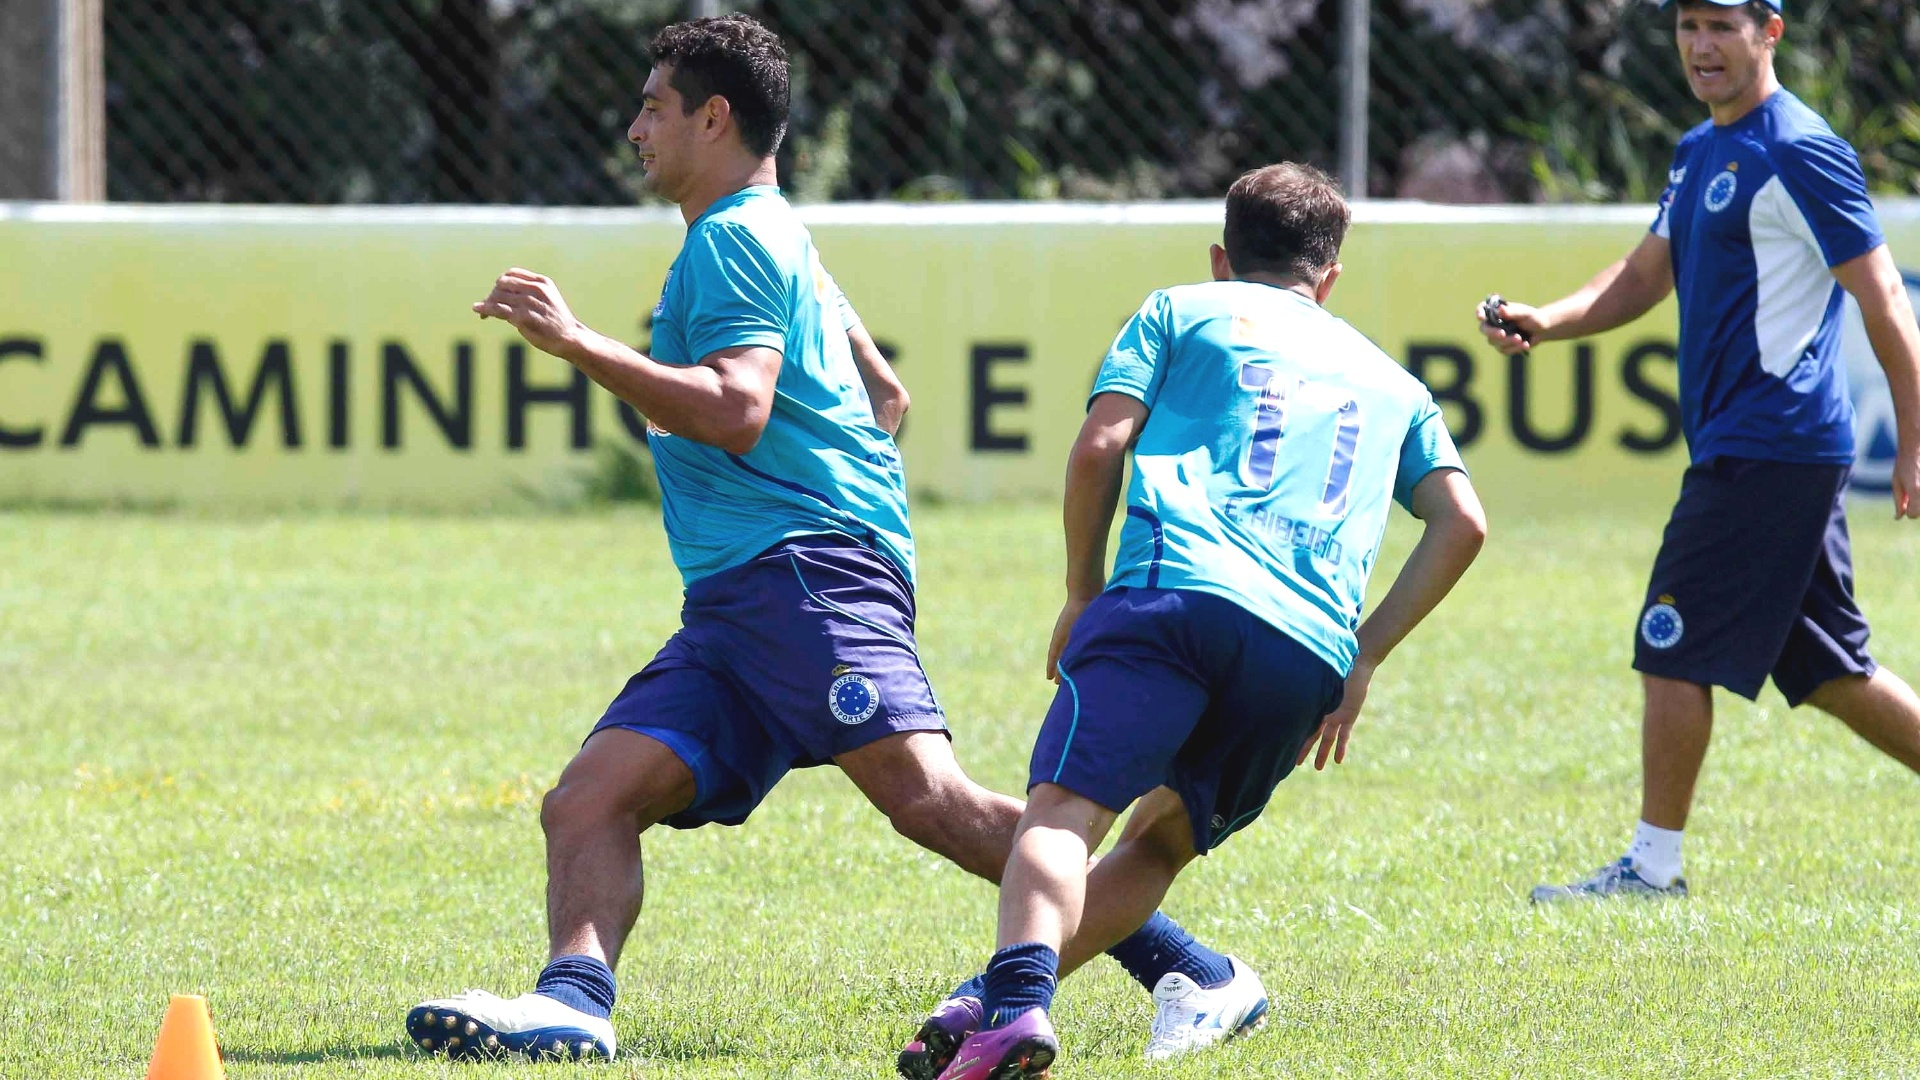 Diego Souza e Everton Ribeiro participam de treino do Cruzeiro na Toca da Raposa II (2/4/2013)